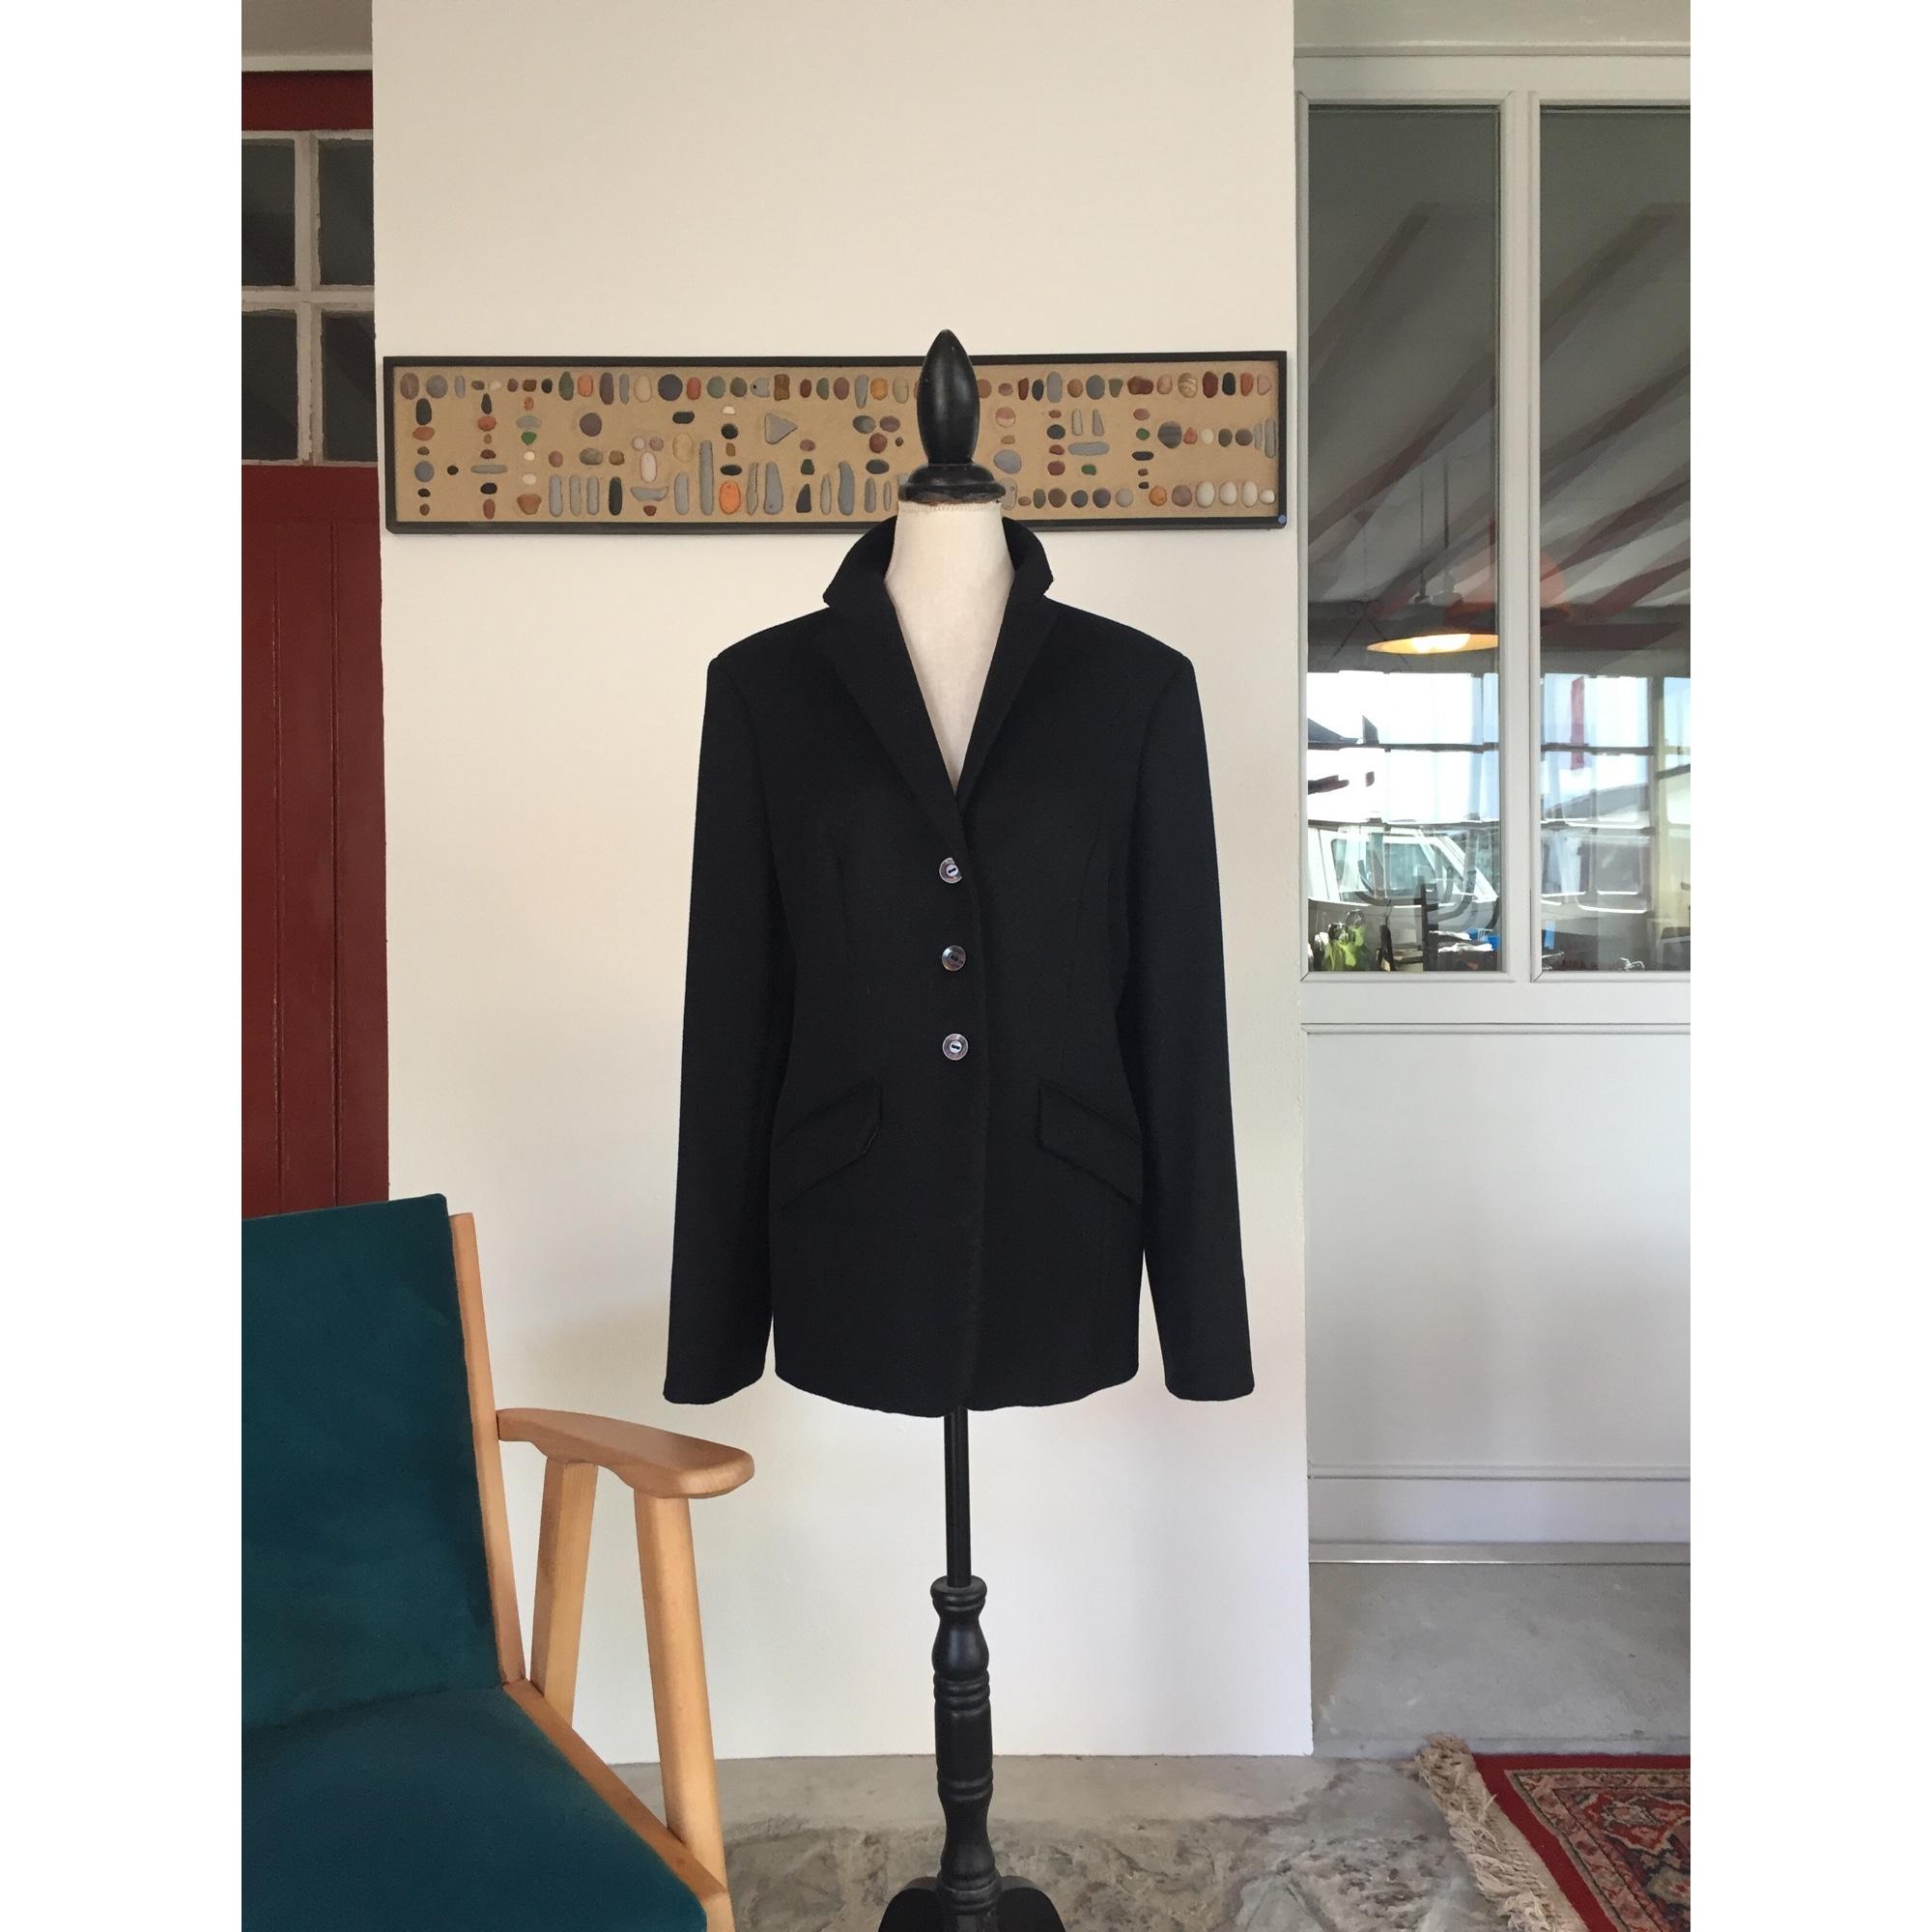 Veste OLIVER GRANT 46 (XXL) noir vendu par Bernardino 8765301